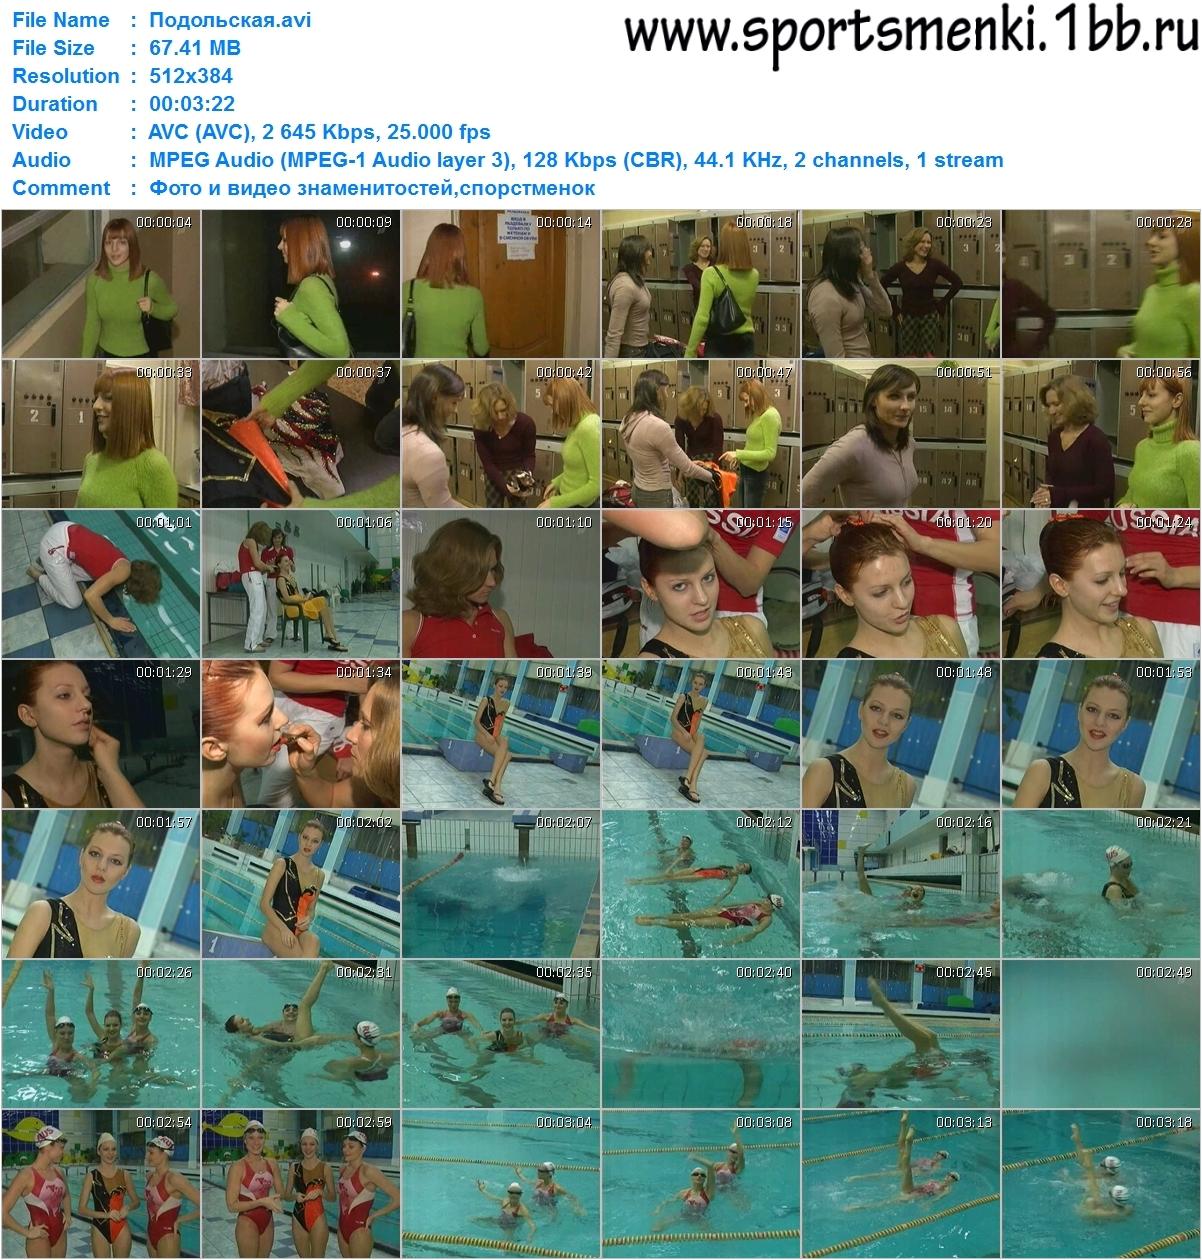 http://i4.imageban.ru/out/2011/02/21/3d2f83cdfca3d660be7635ffd8b3f863.jpg